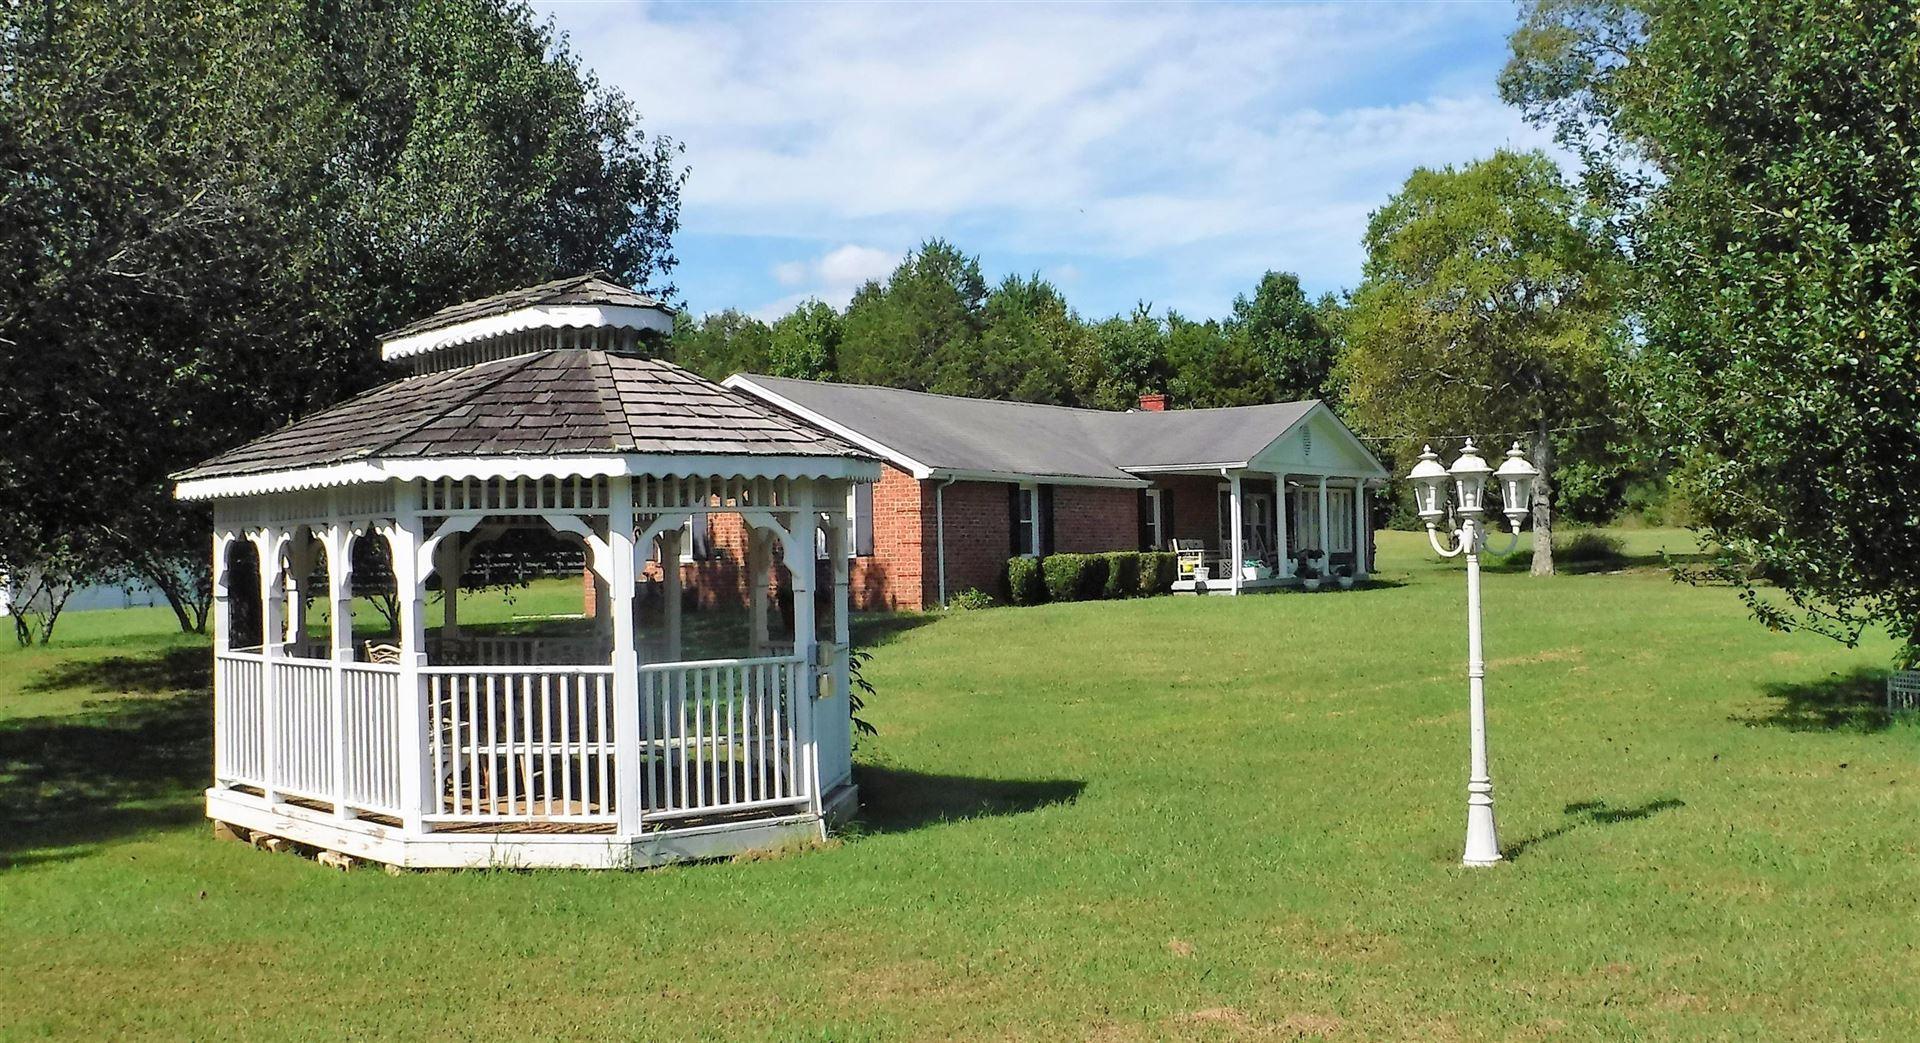 Photo of 3111 Halls Hill Pike, Murfreesboro, TN 37130 (MLS # 1978267)